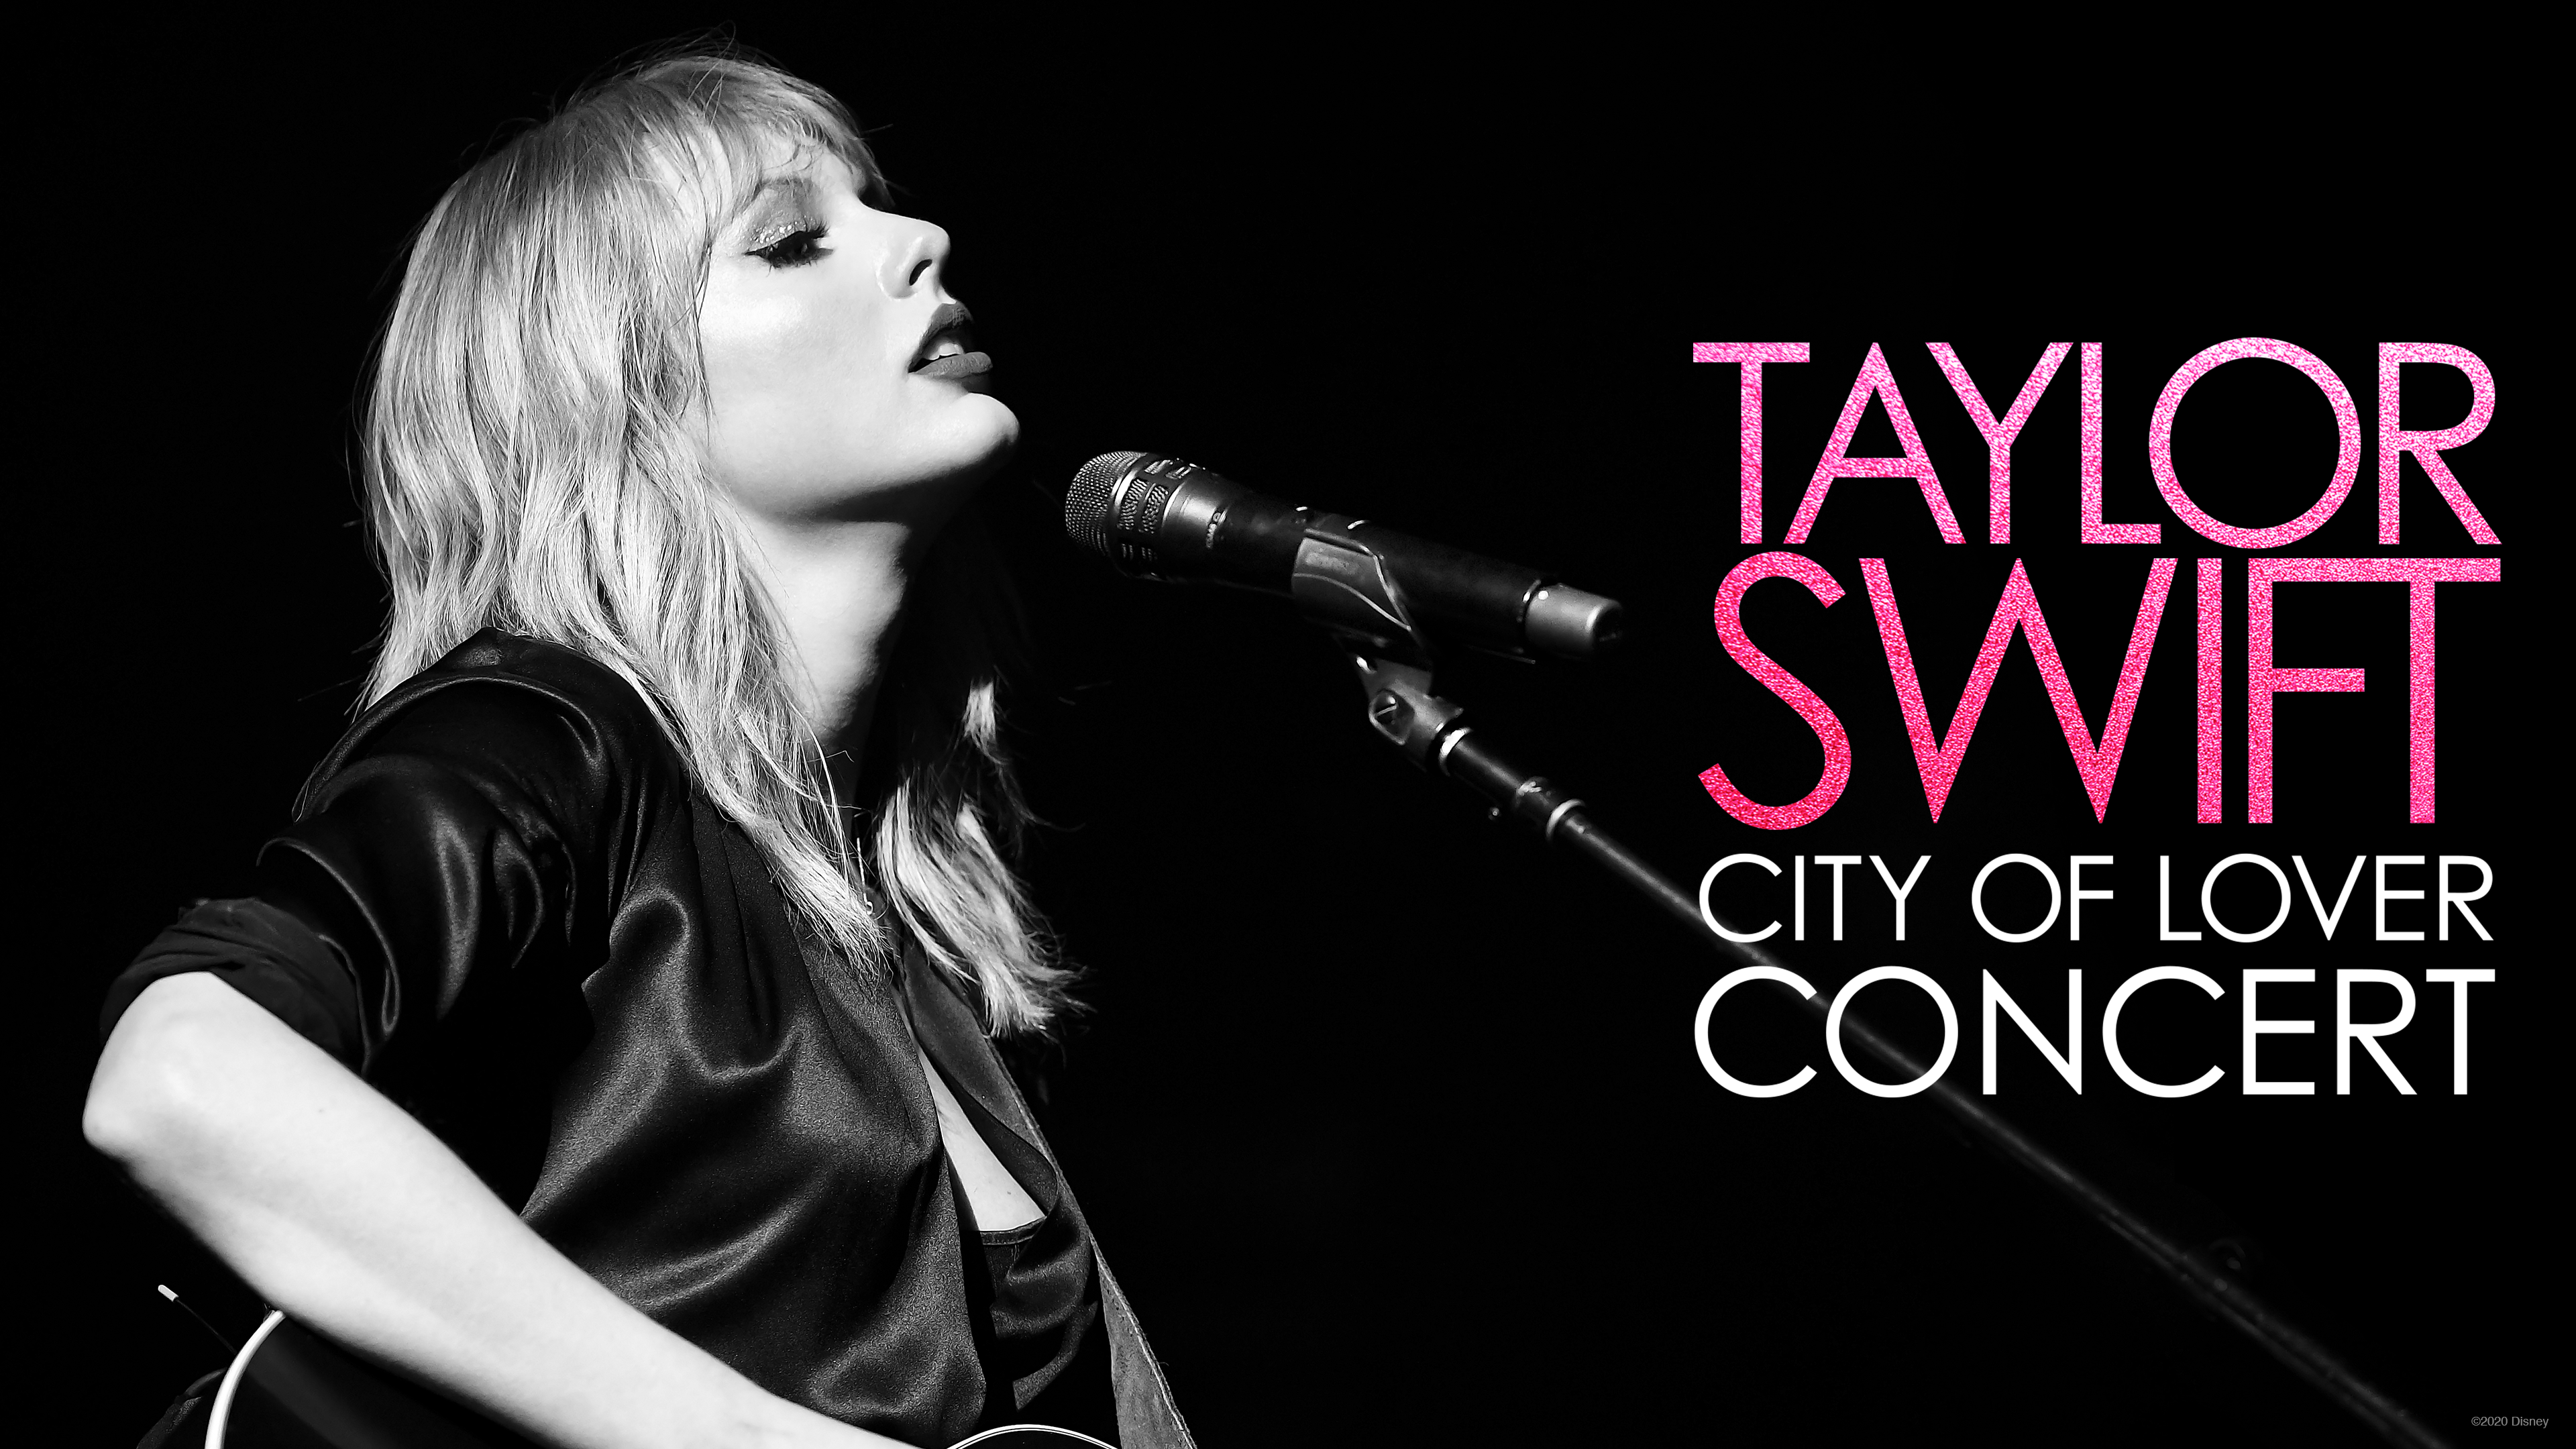 Taylor Swift (para fans de Ryan Adams) - Página 7 04F0C73B68325B690030D9879E2F37AFFB8F3870C1AC8C9974C20971422AC822